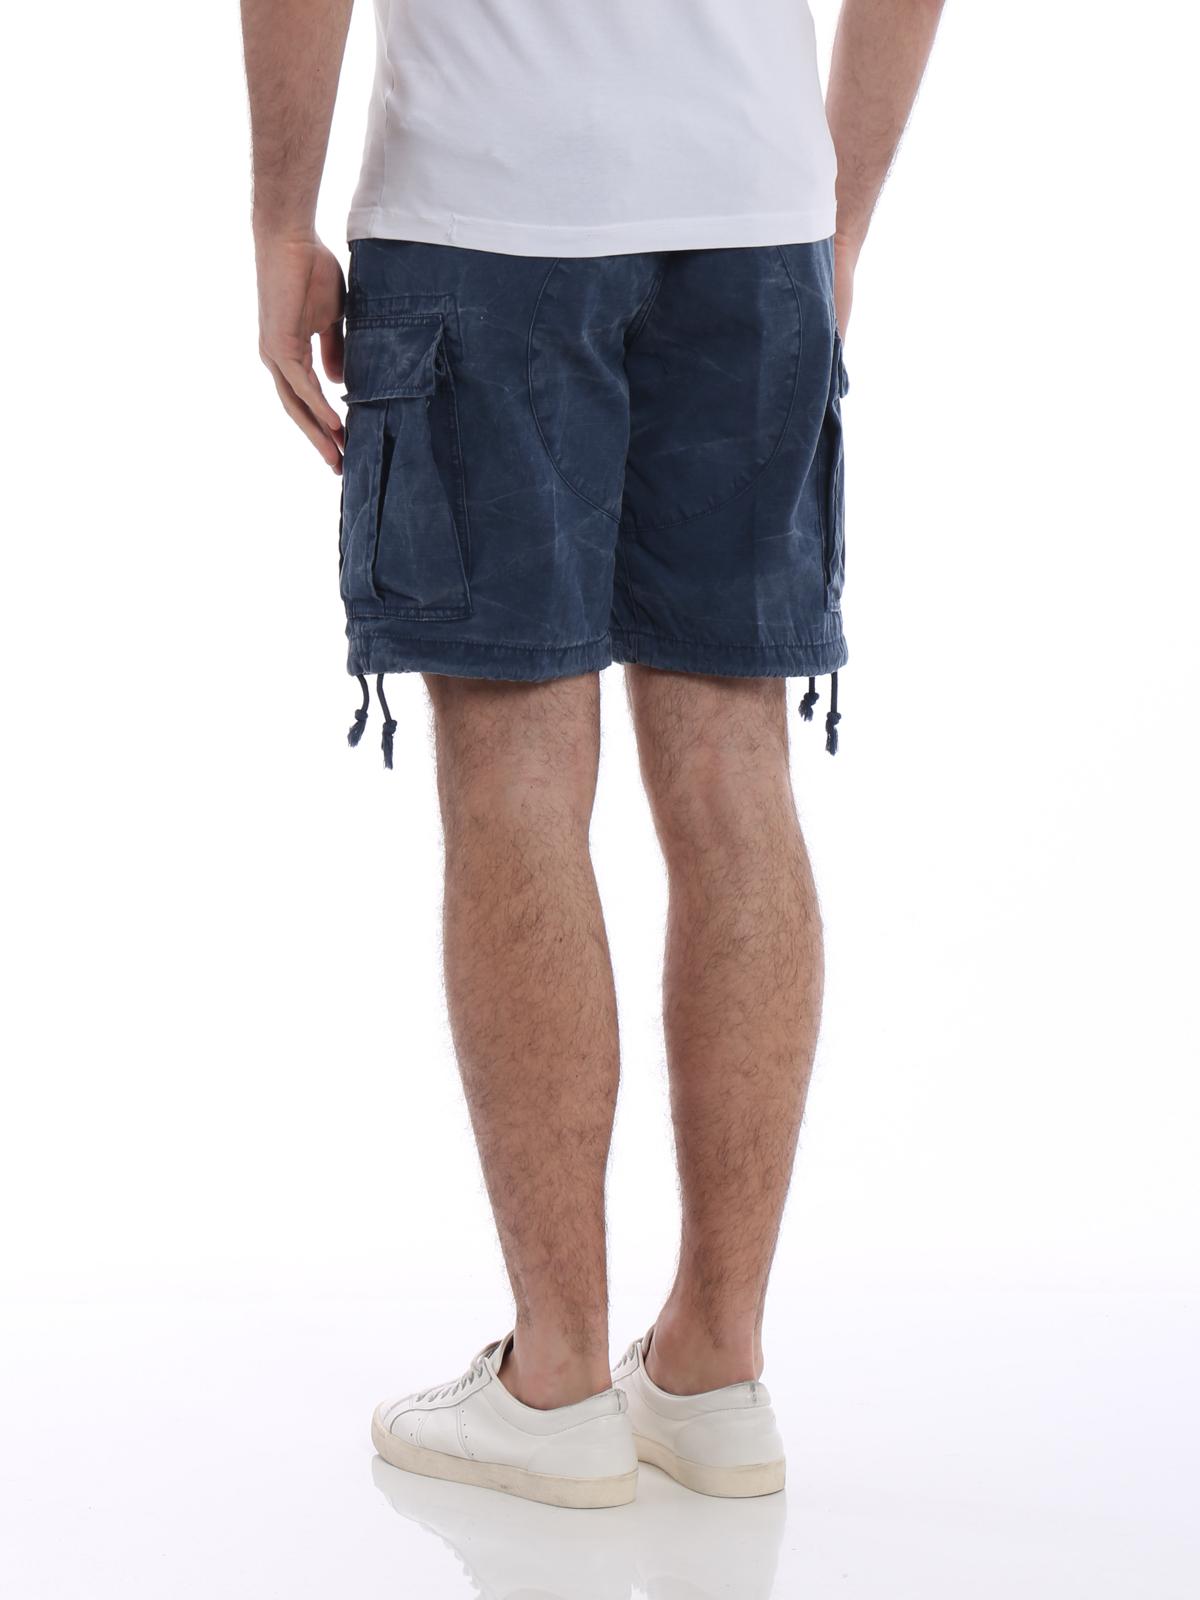 cdd321092a Polo Ralph Lauren - Classic Fit cargo short pants - Trousers Shorts ...